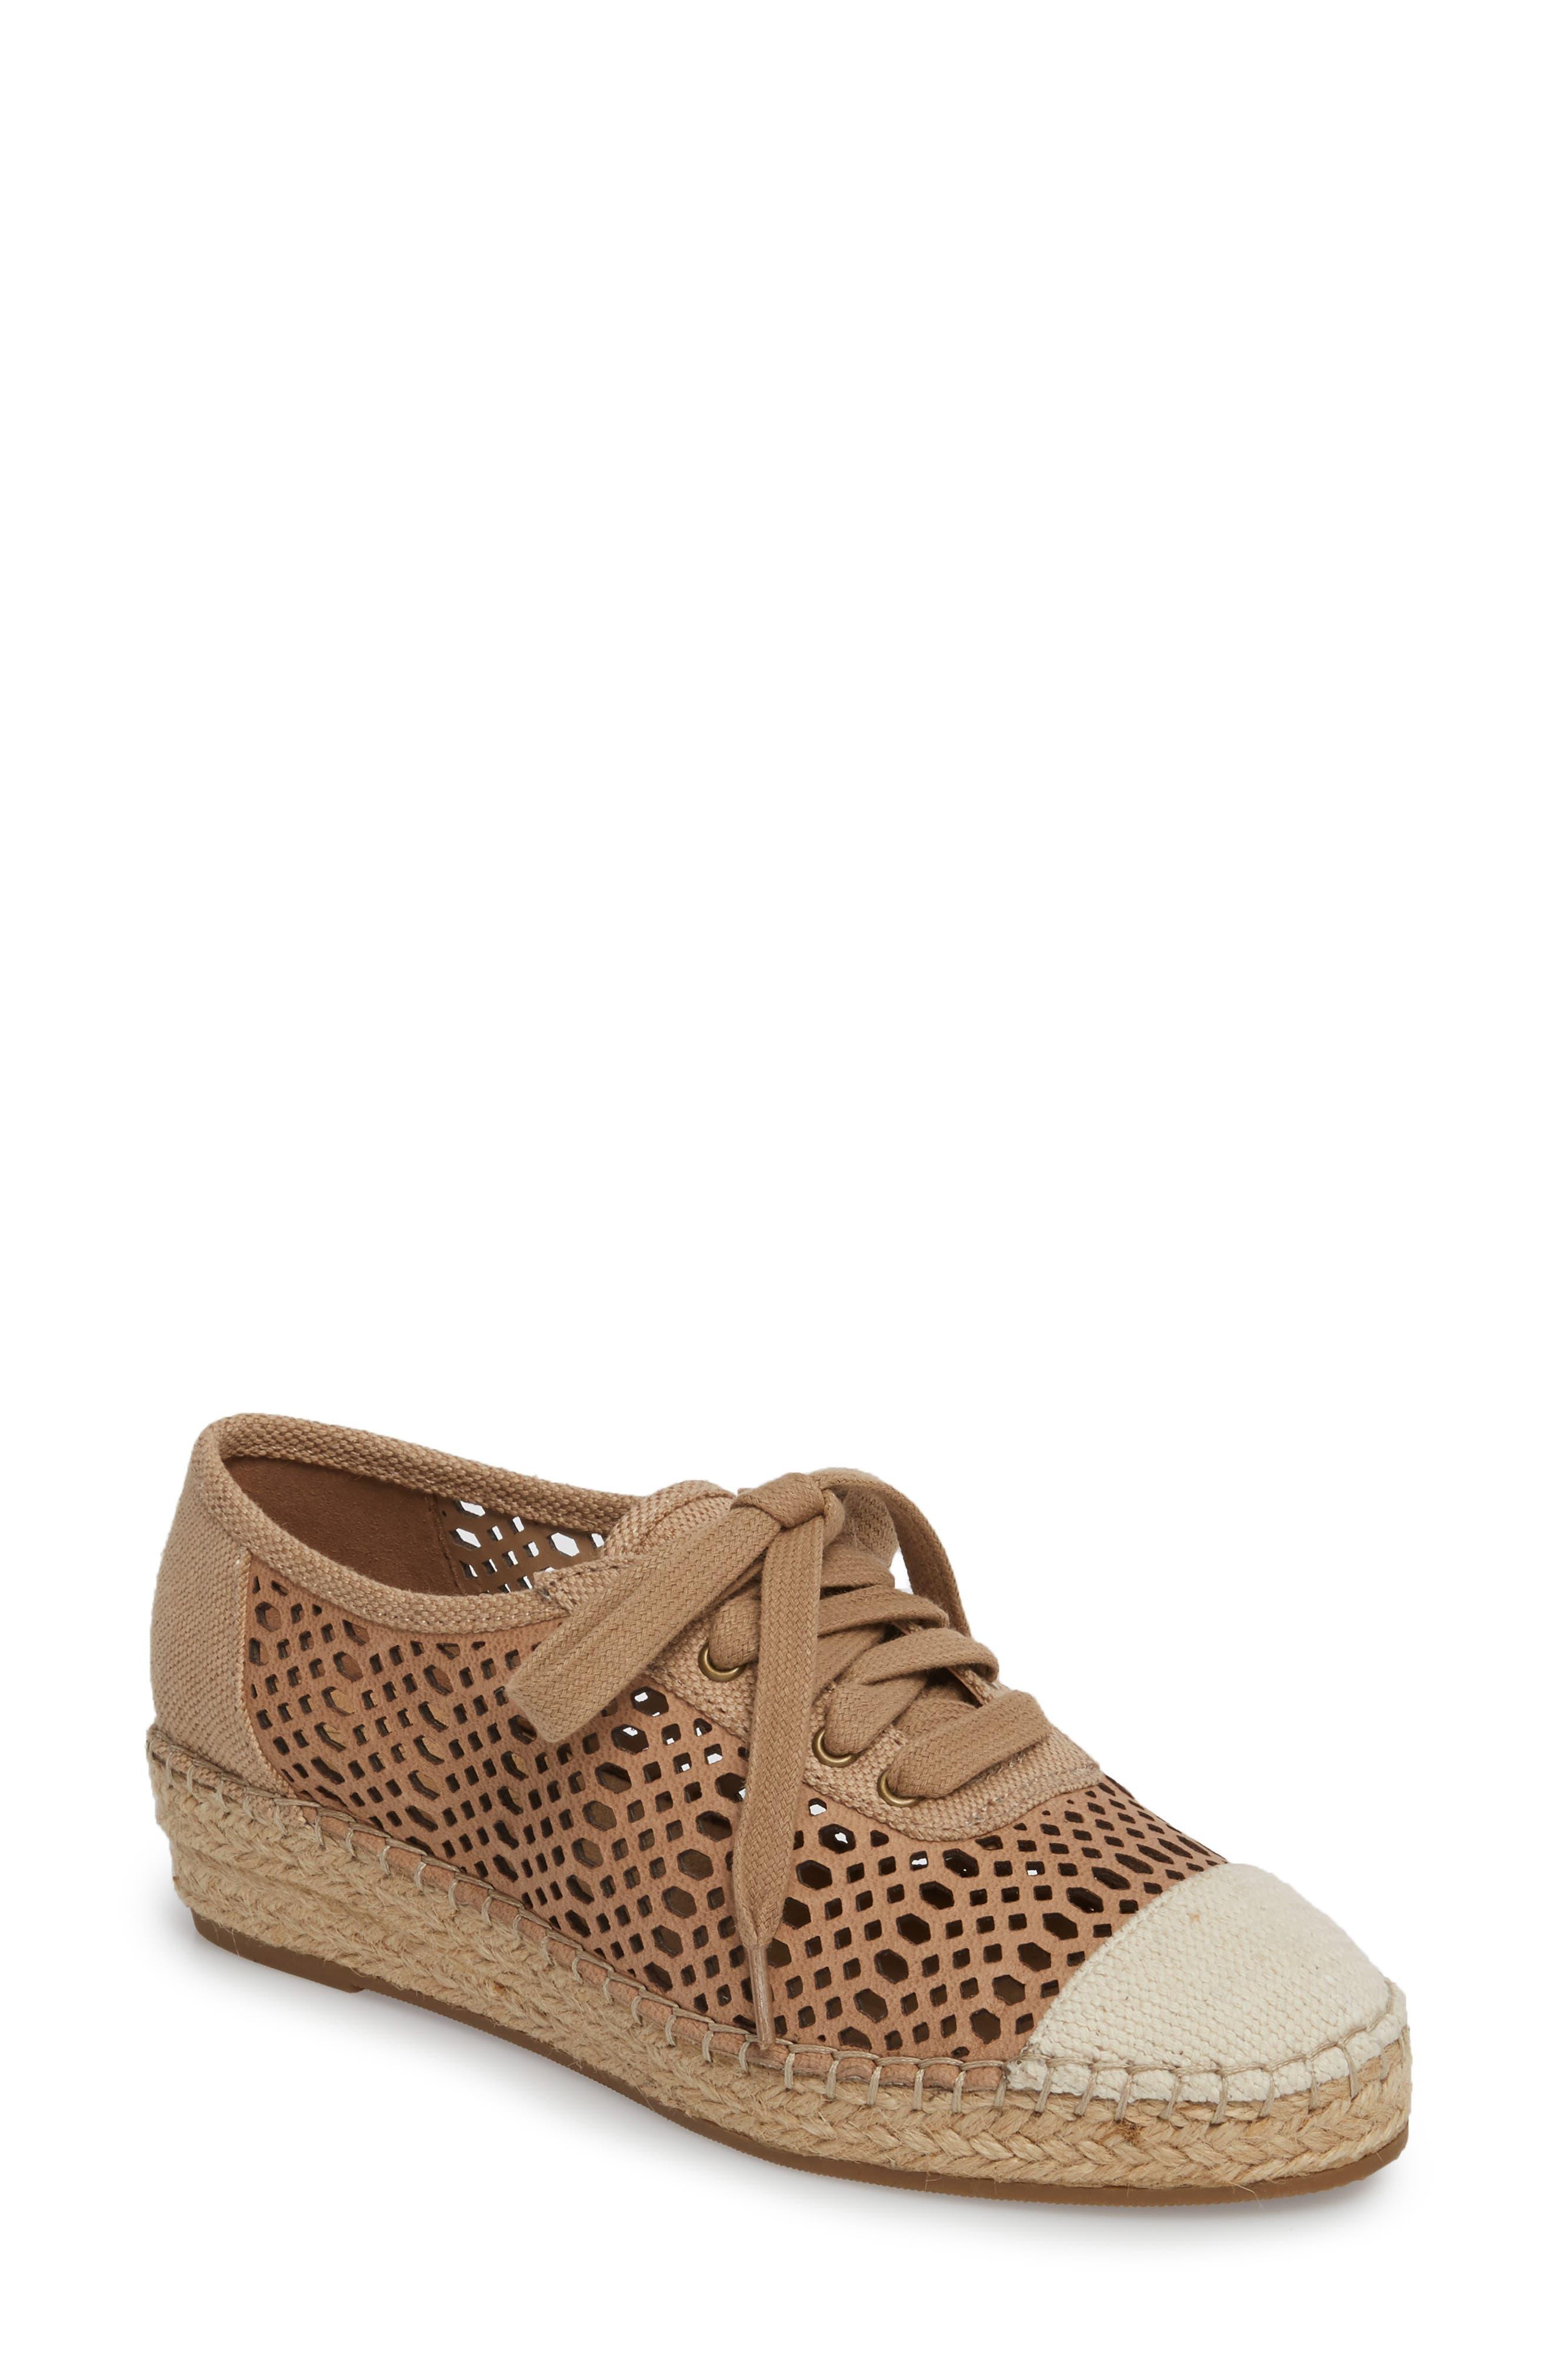 Bella Vita Clementine Espadrille Sneaker (Women)